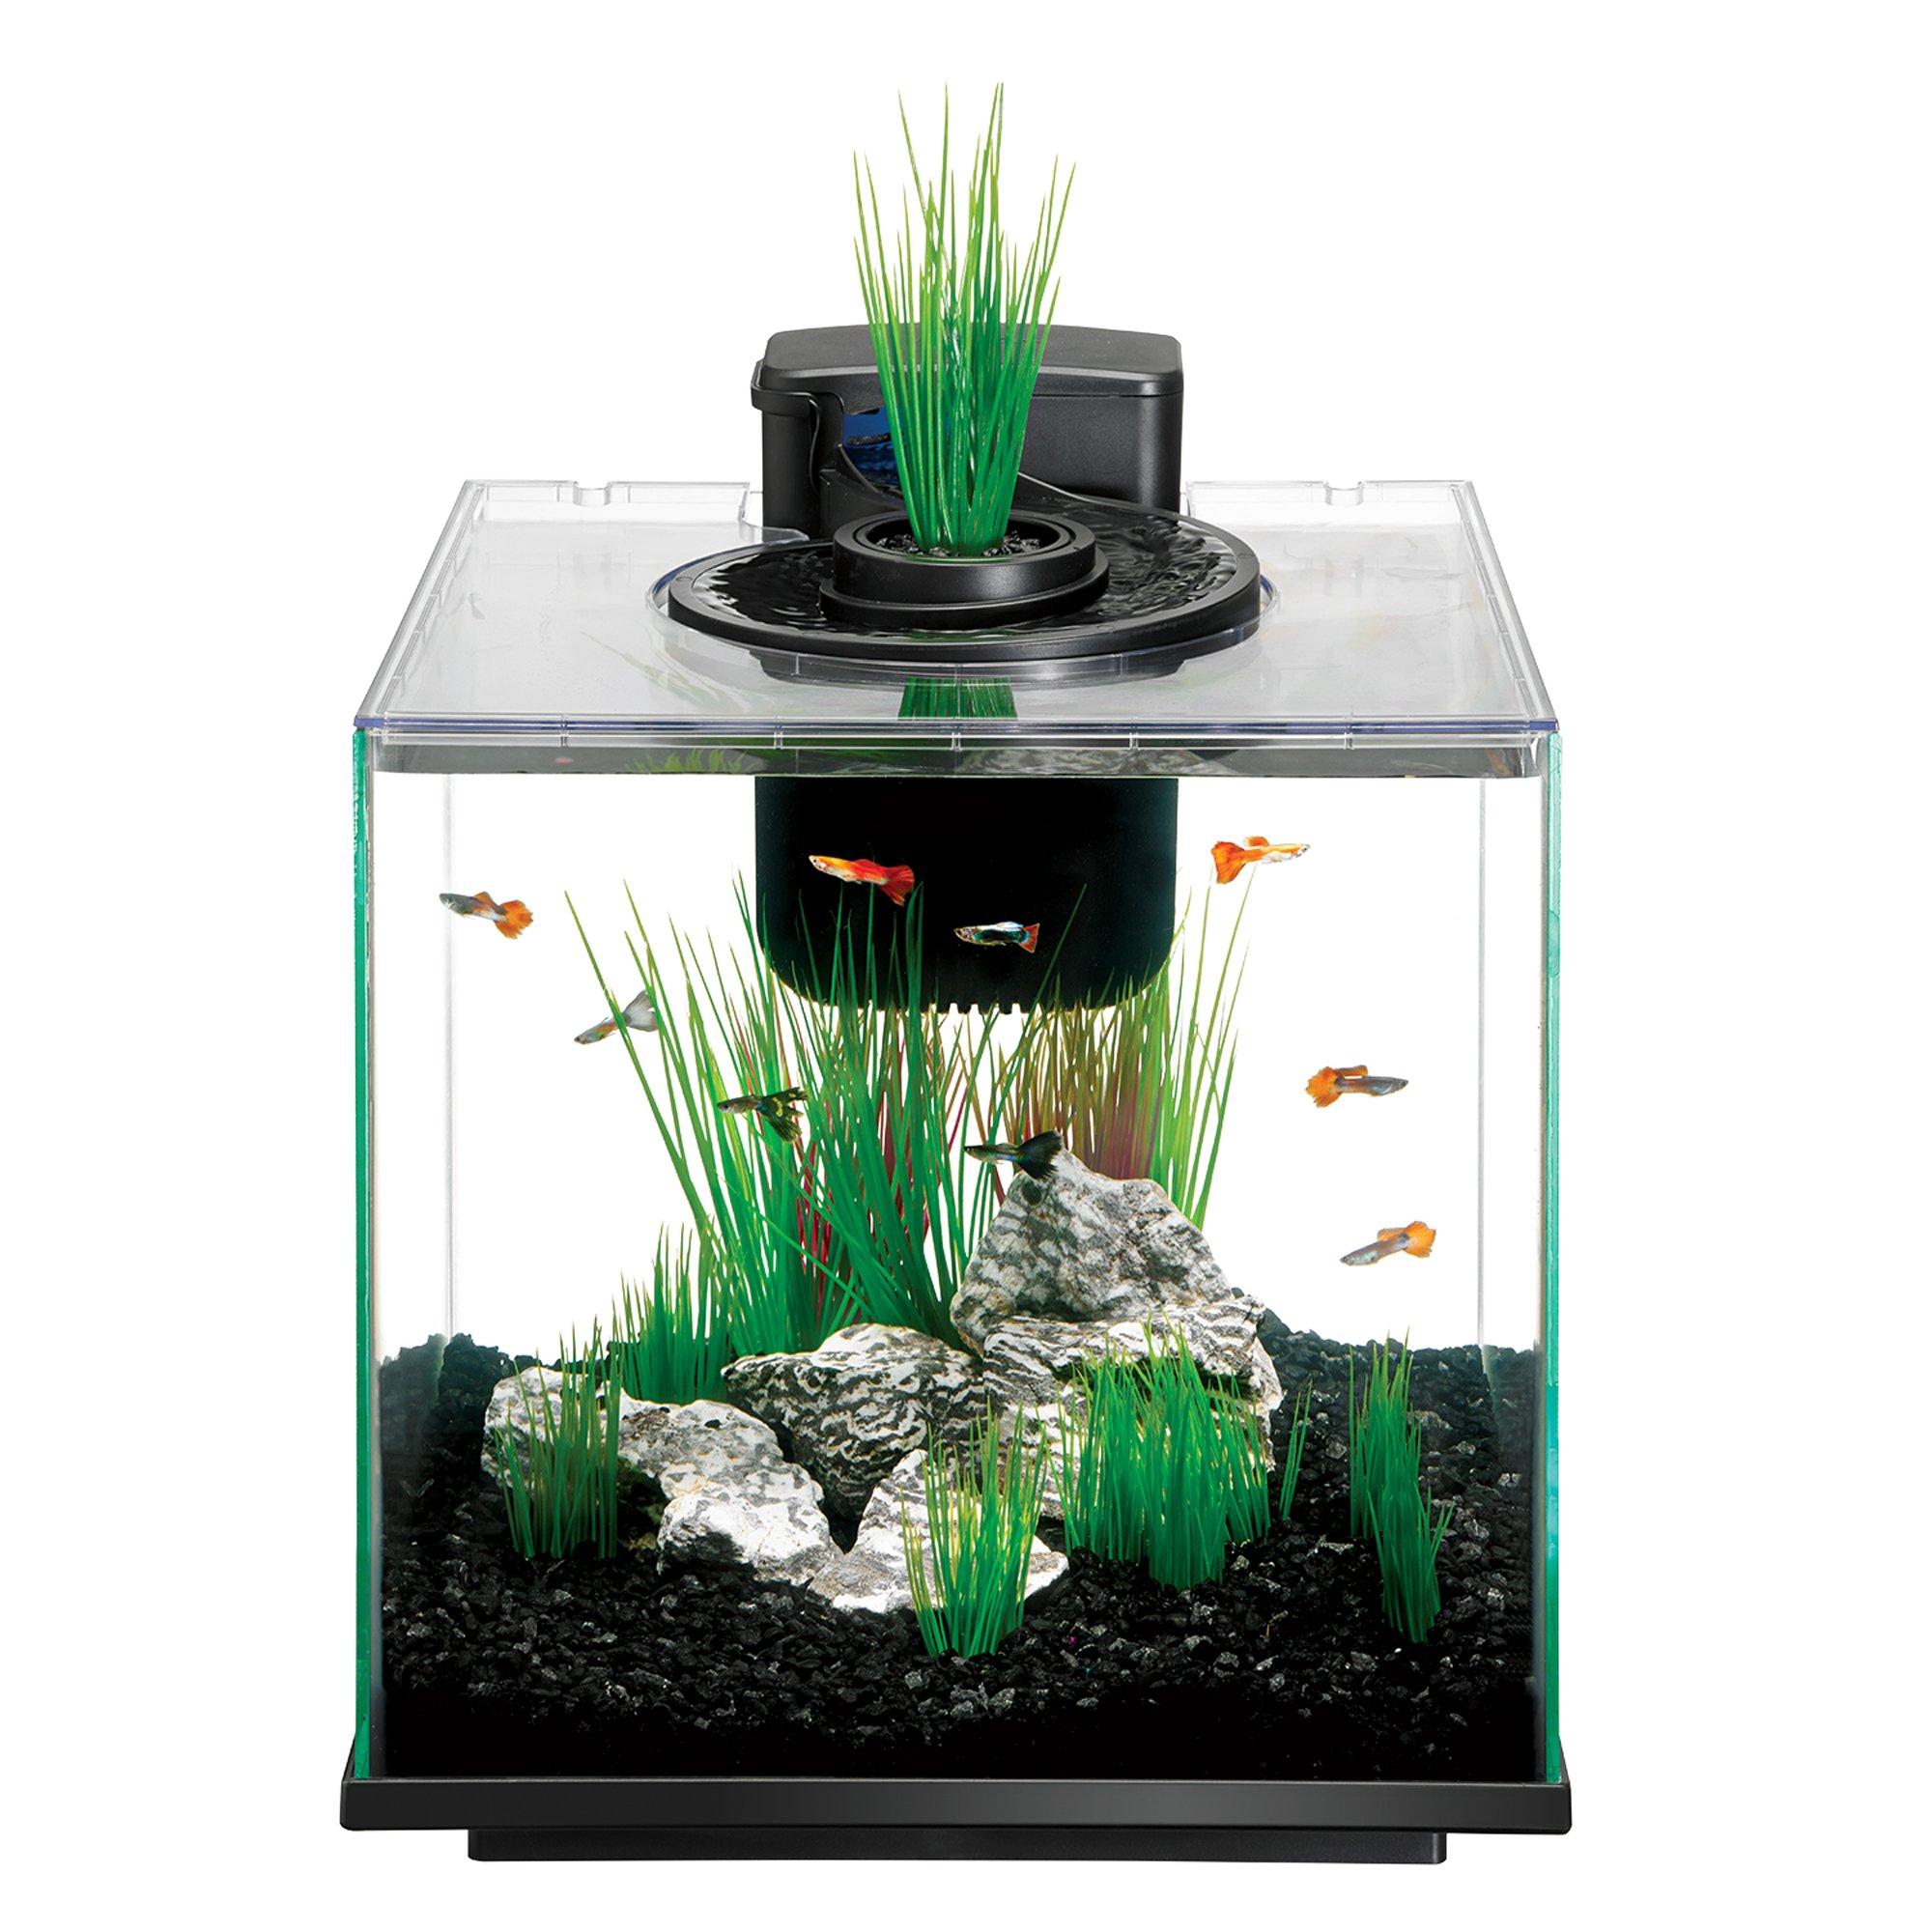 Aqueon 8 8 gal aqua springs kit petco for Petco small fish tank